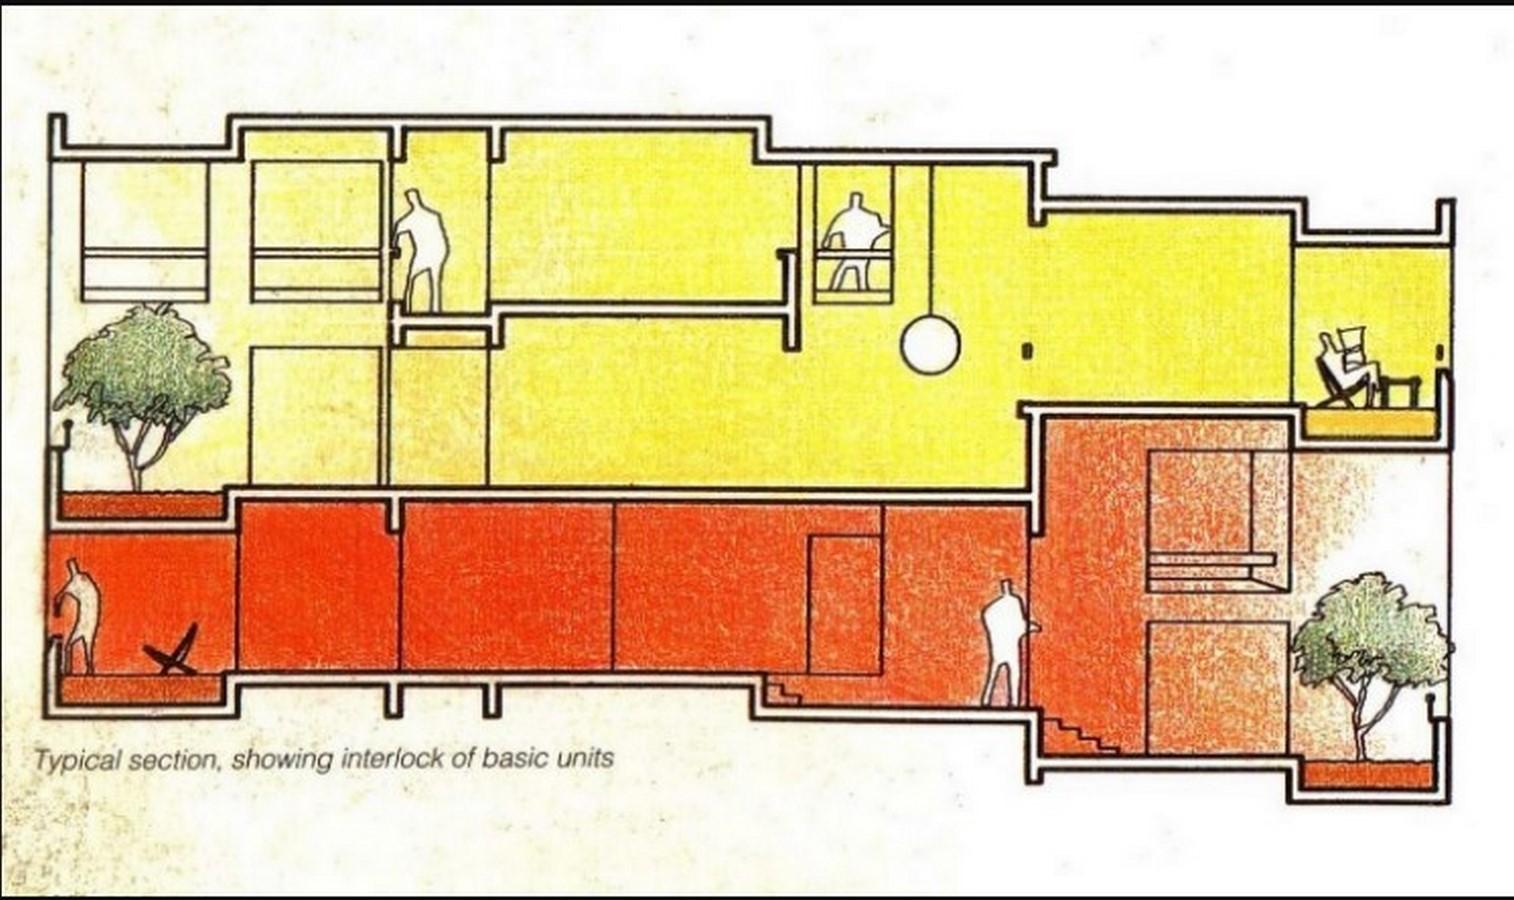 Kanchanjunga Apartments by Charles Correa: The Vertical Bungalows - Sheet4